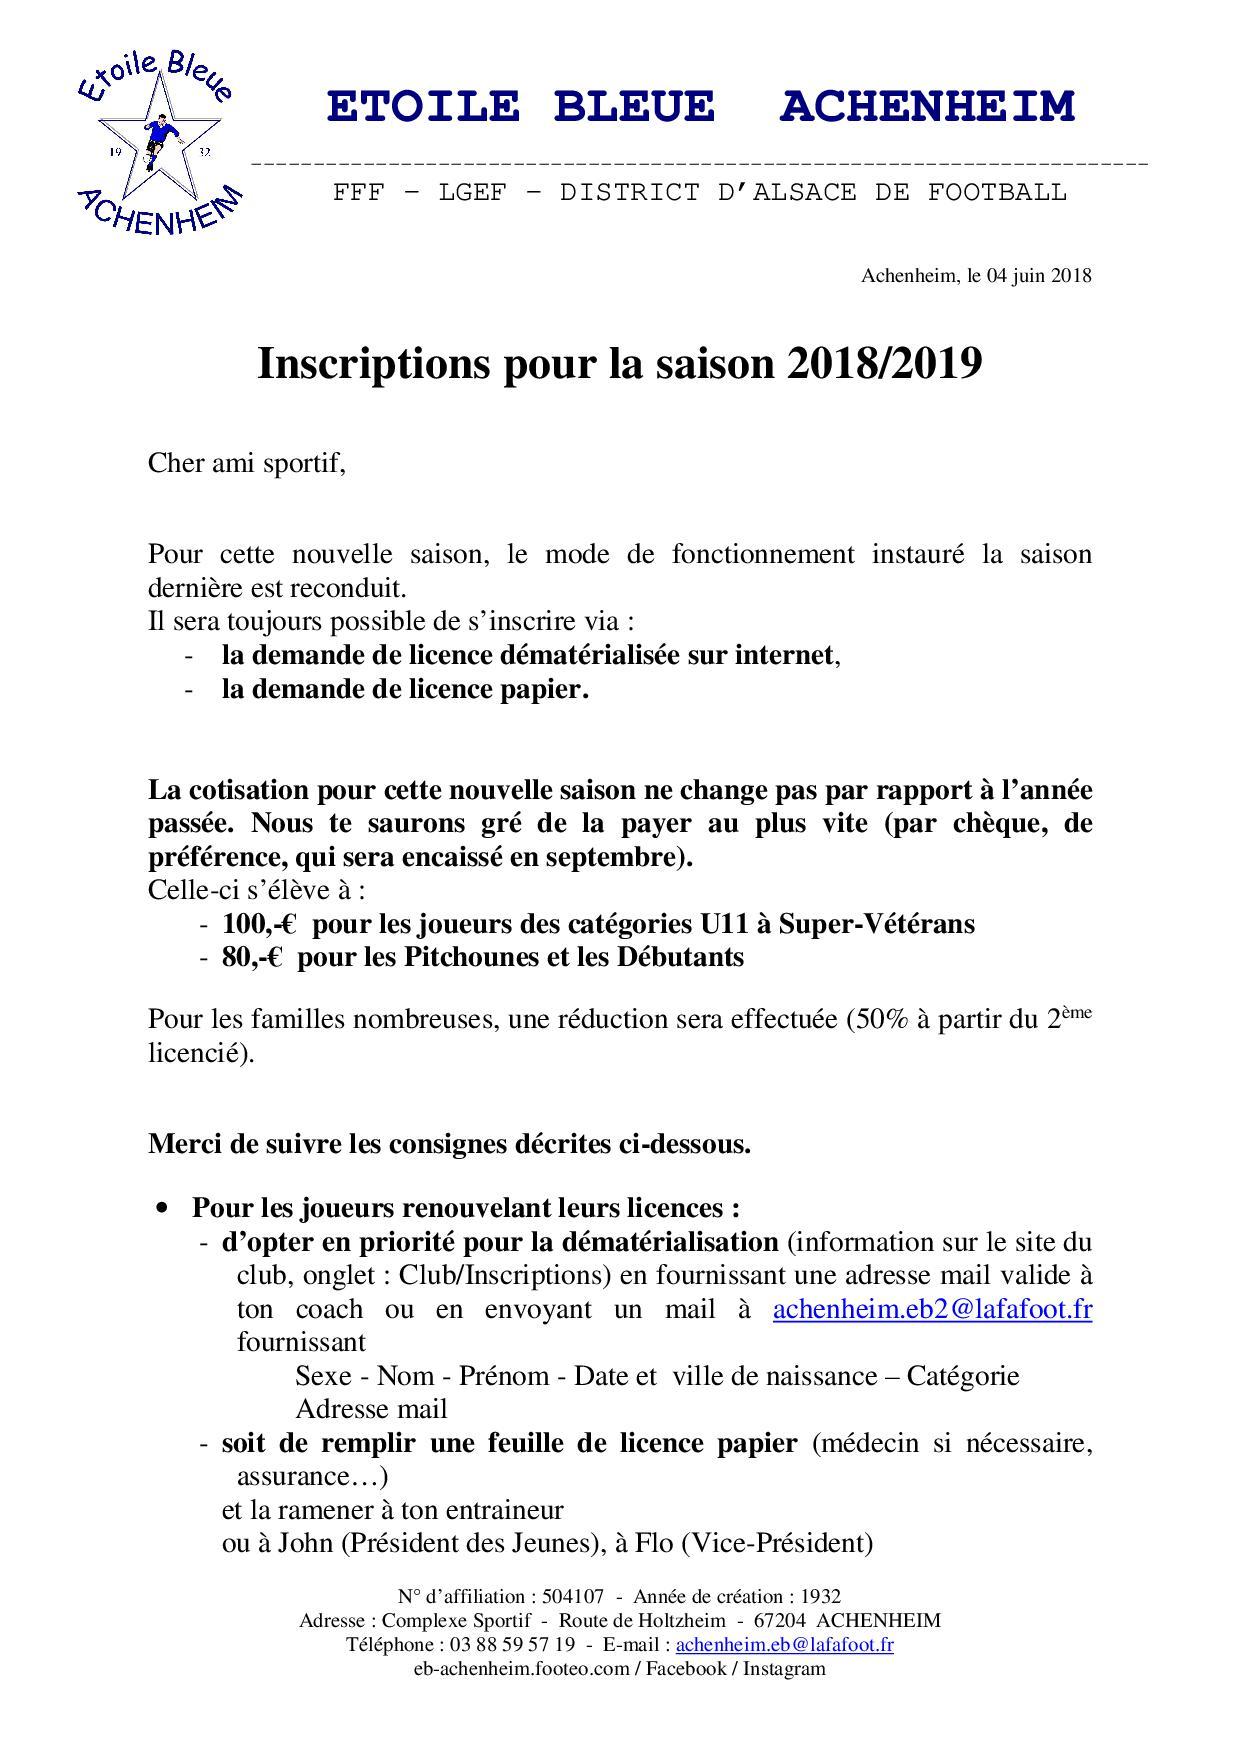 EBA   Signature licence 2018-19 (1).jpg